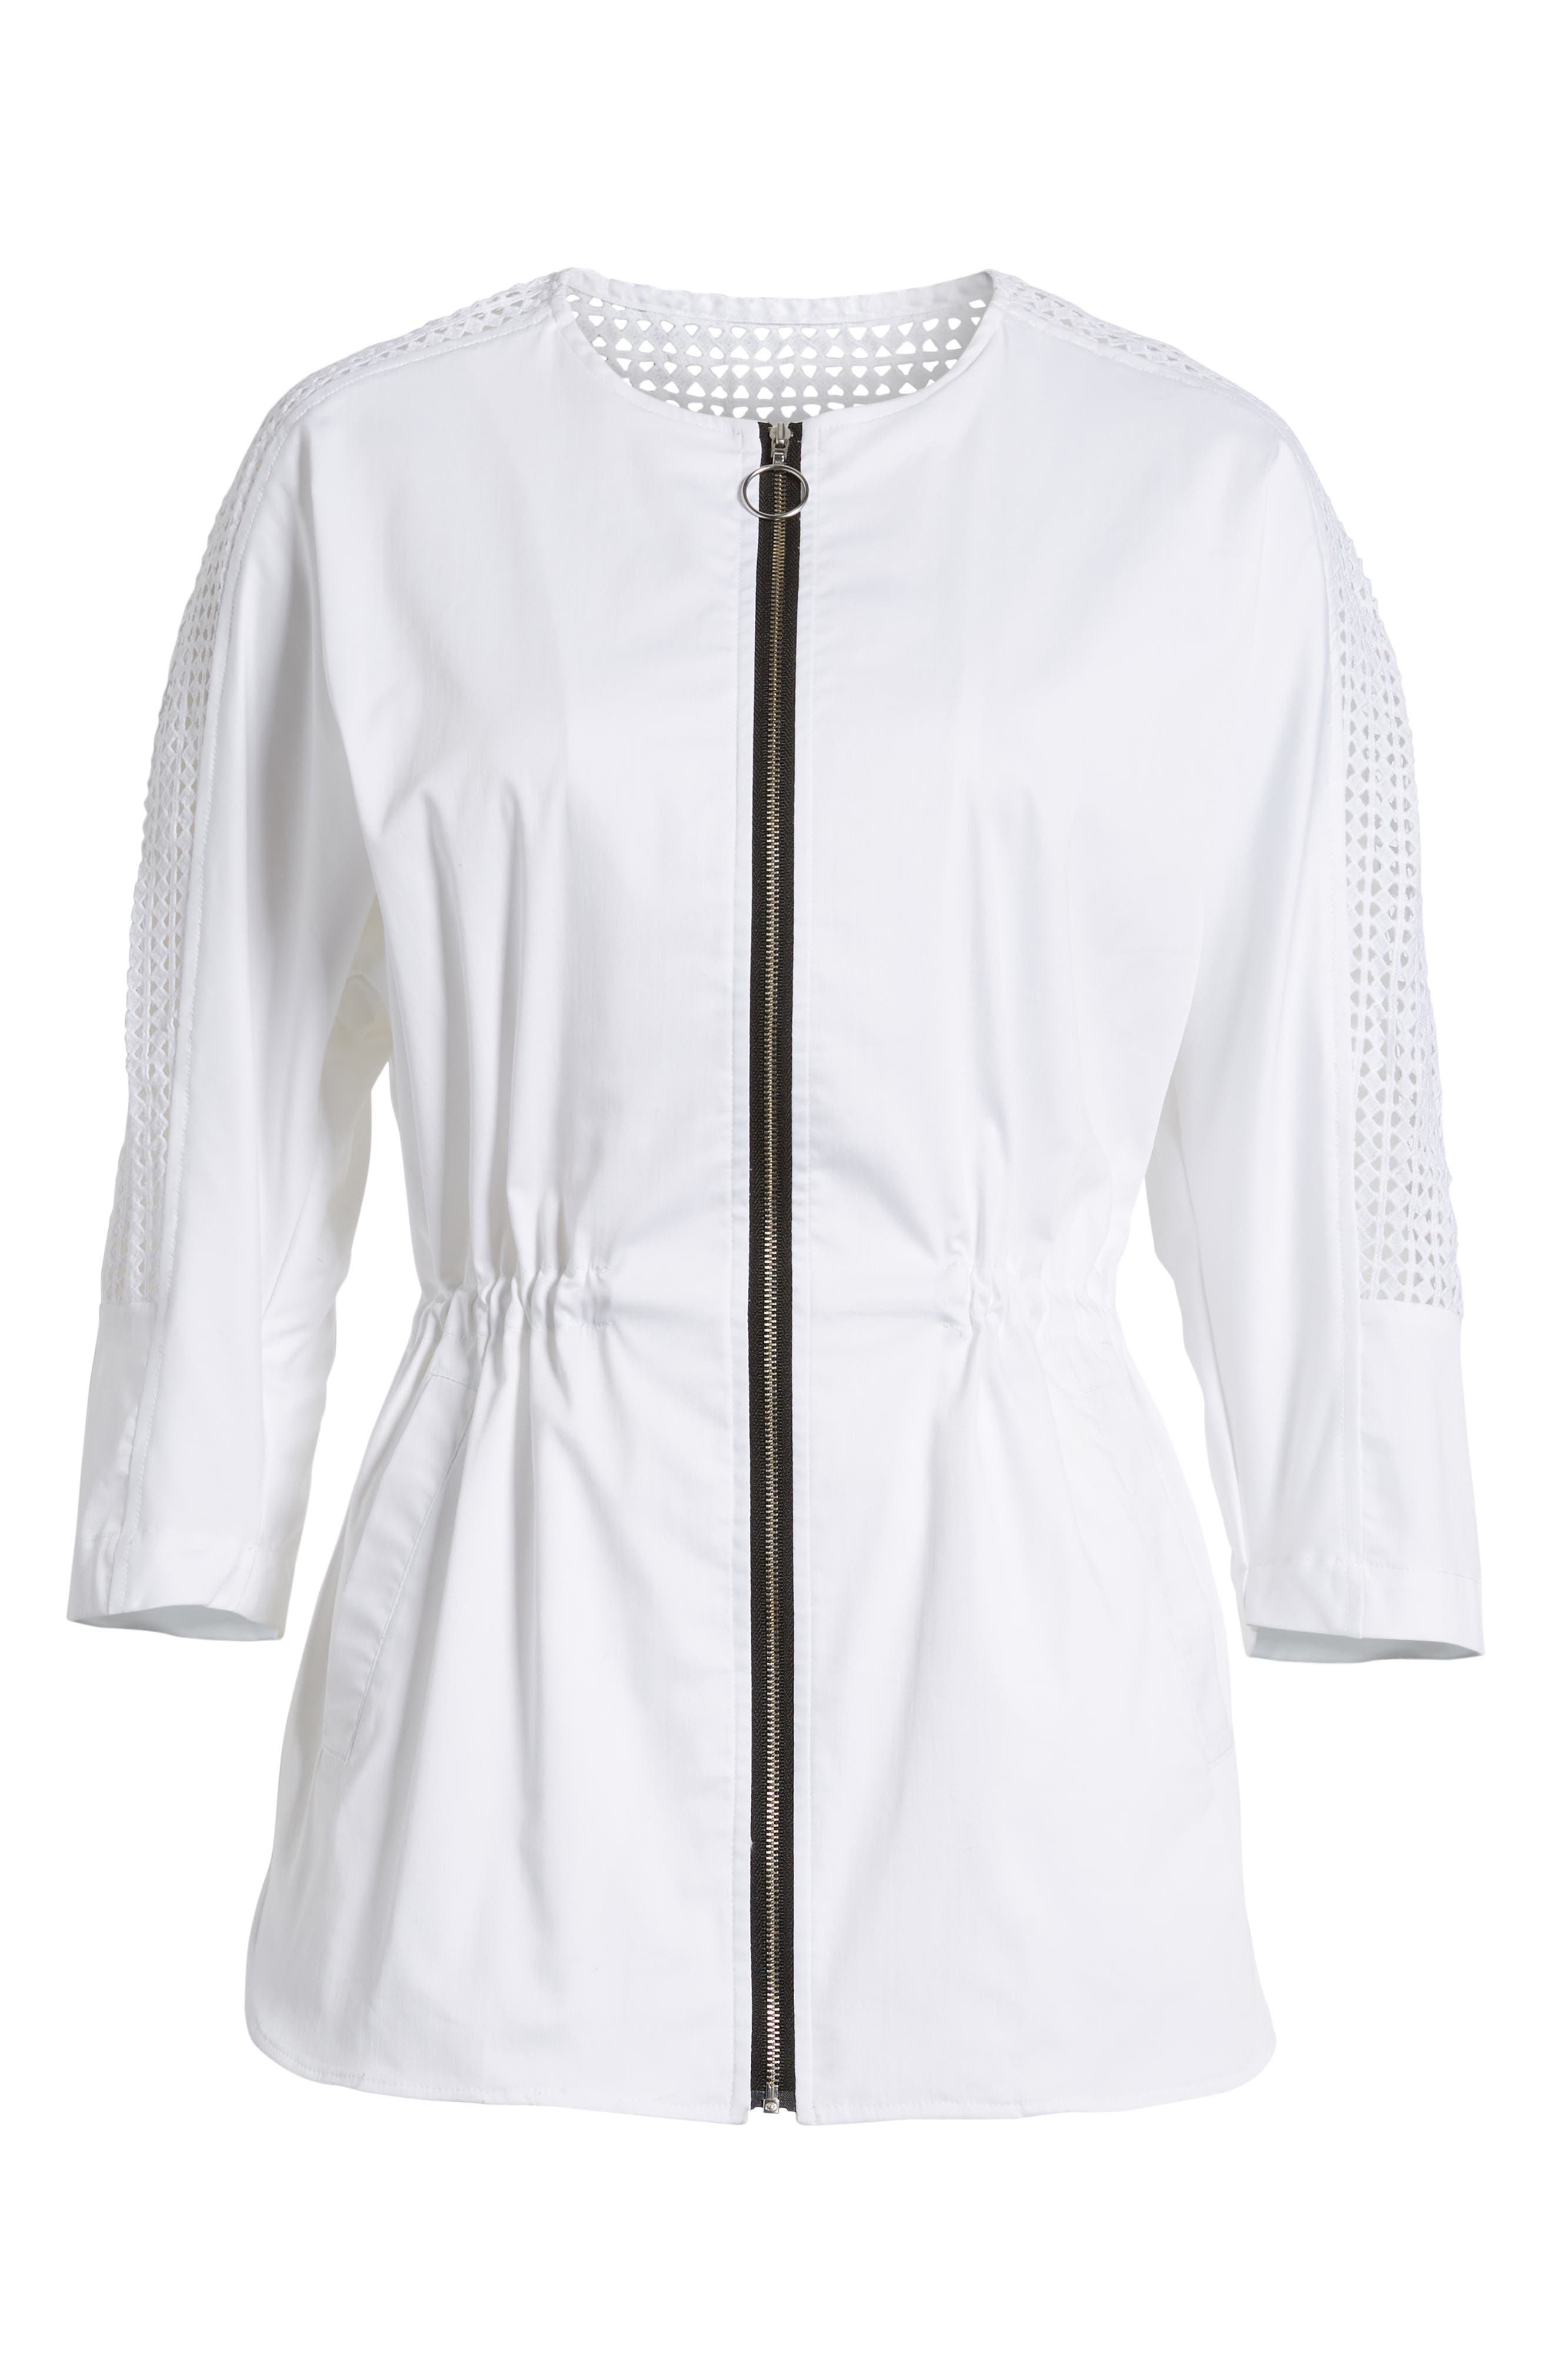 Eyelet Sleeve Front Zip Jacket,                             Alternate thumbnail 6, color,                             White/ Black